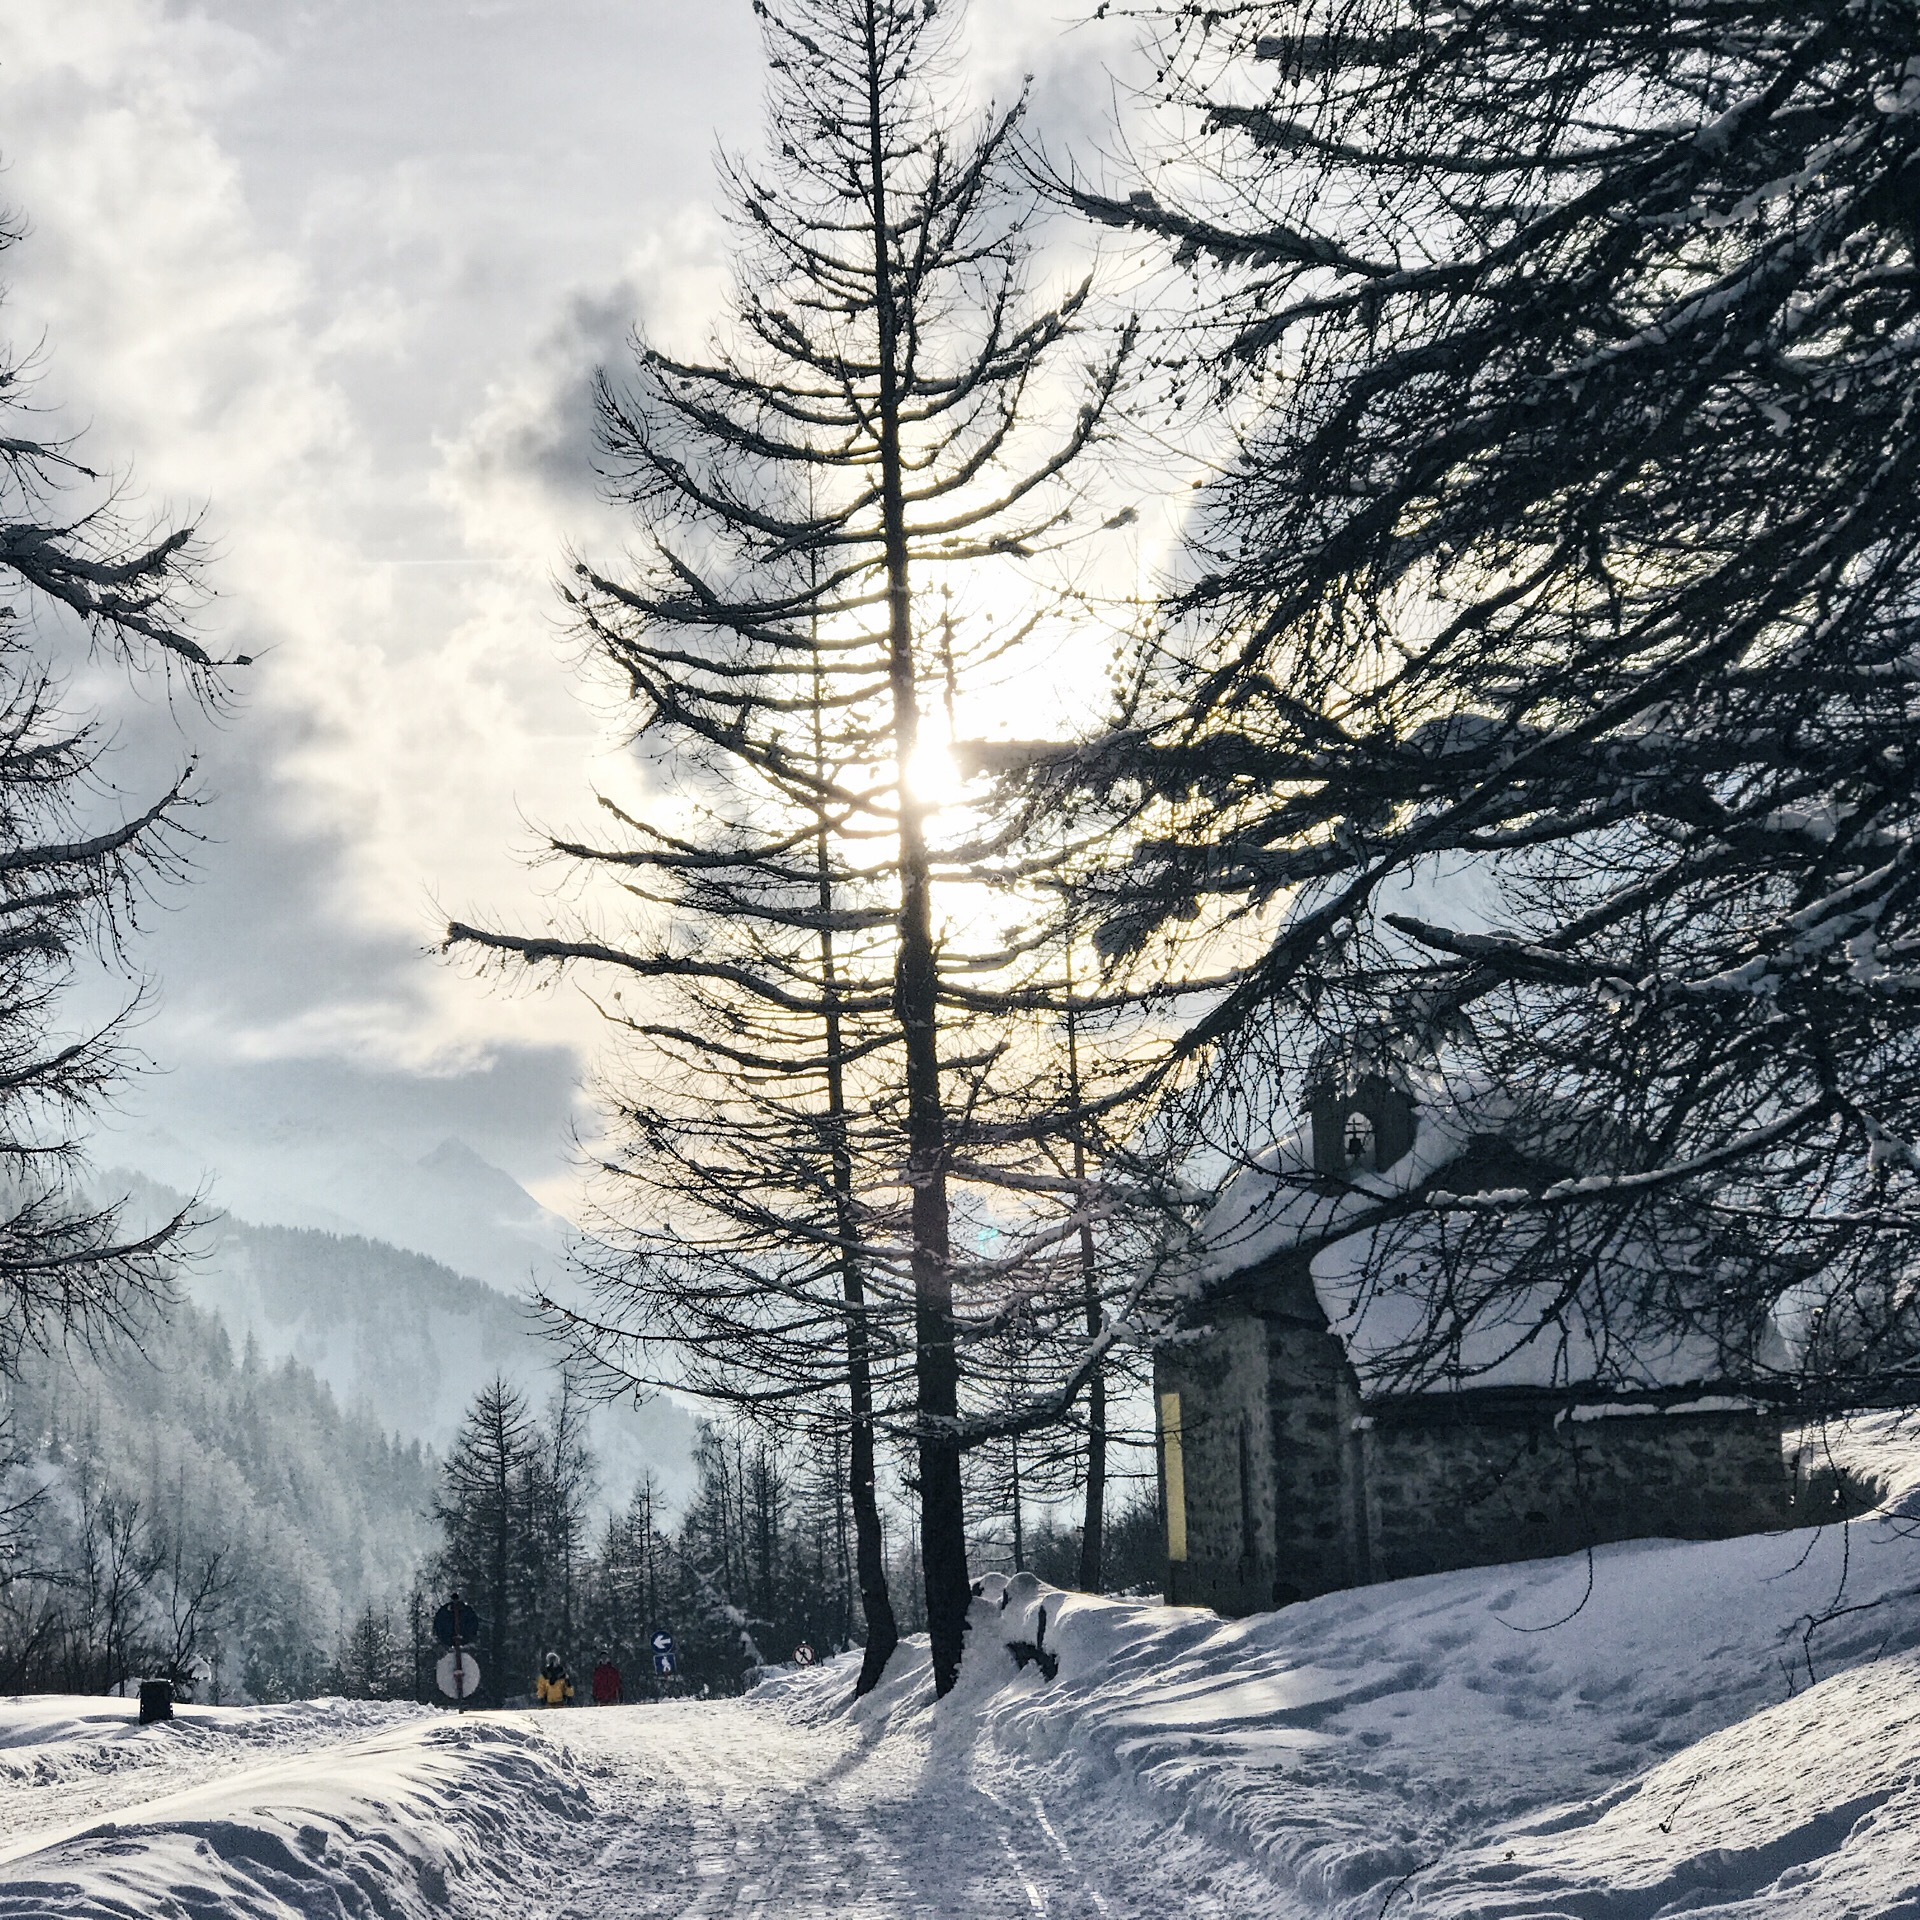 Val ferret Courmayeur winter vacanza invernale